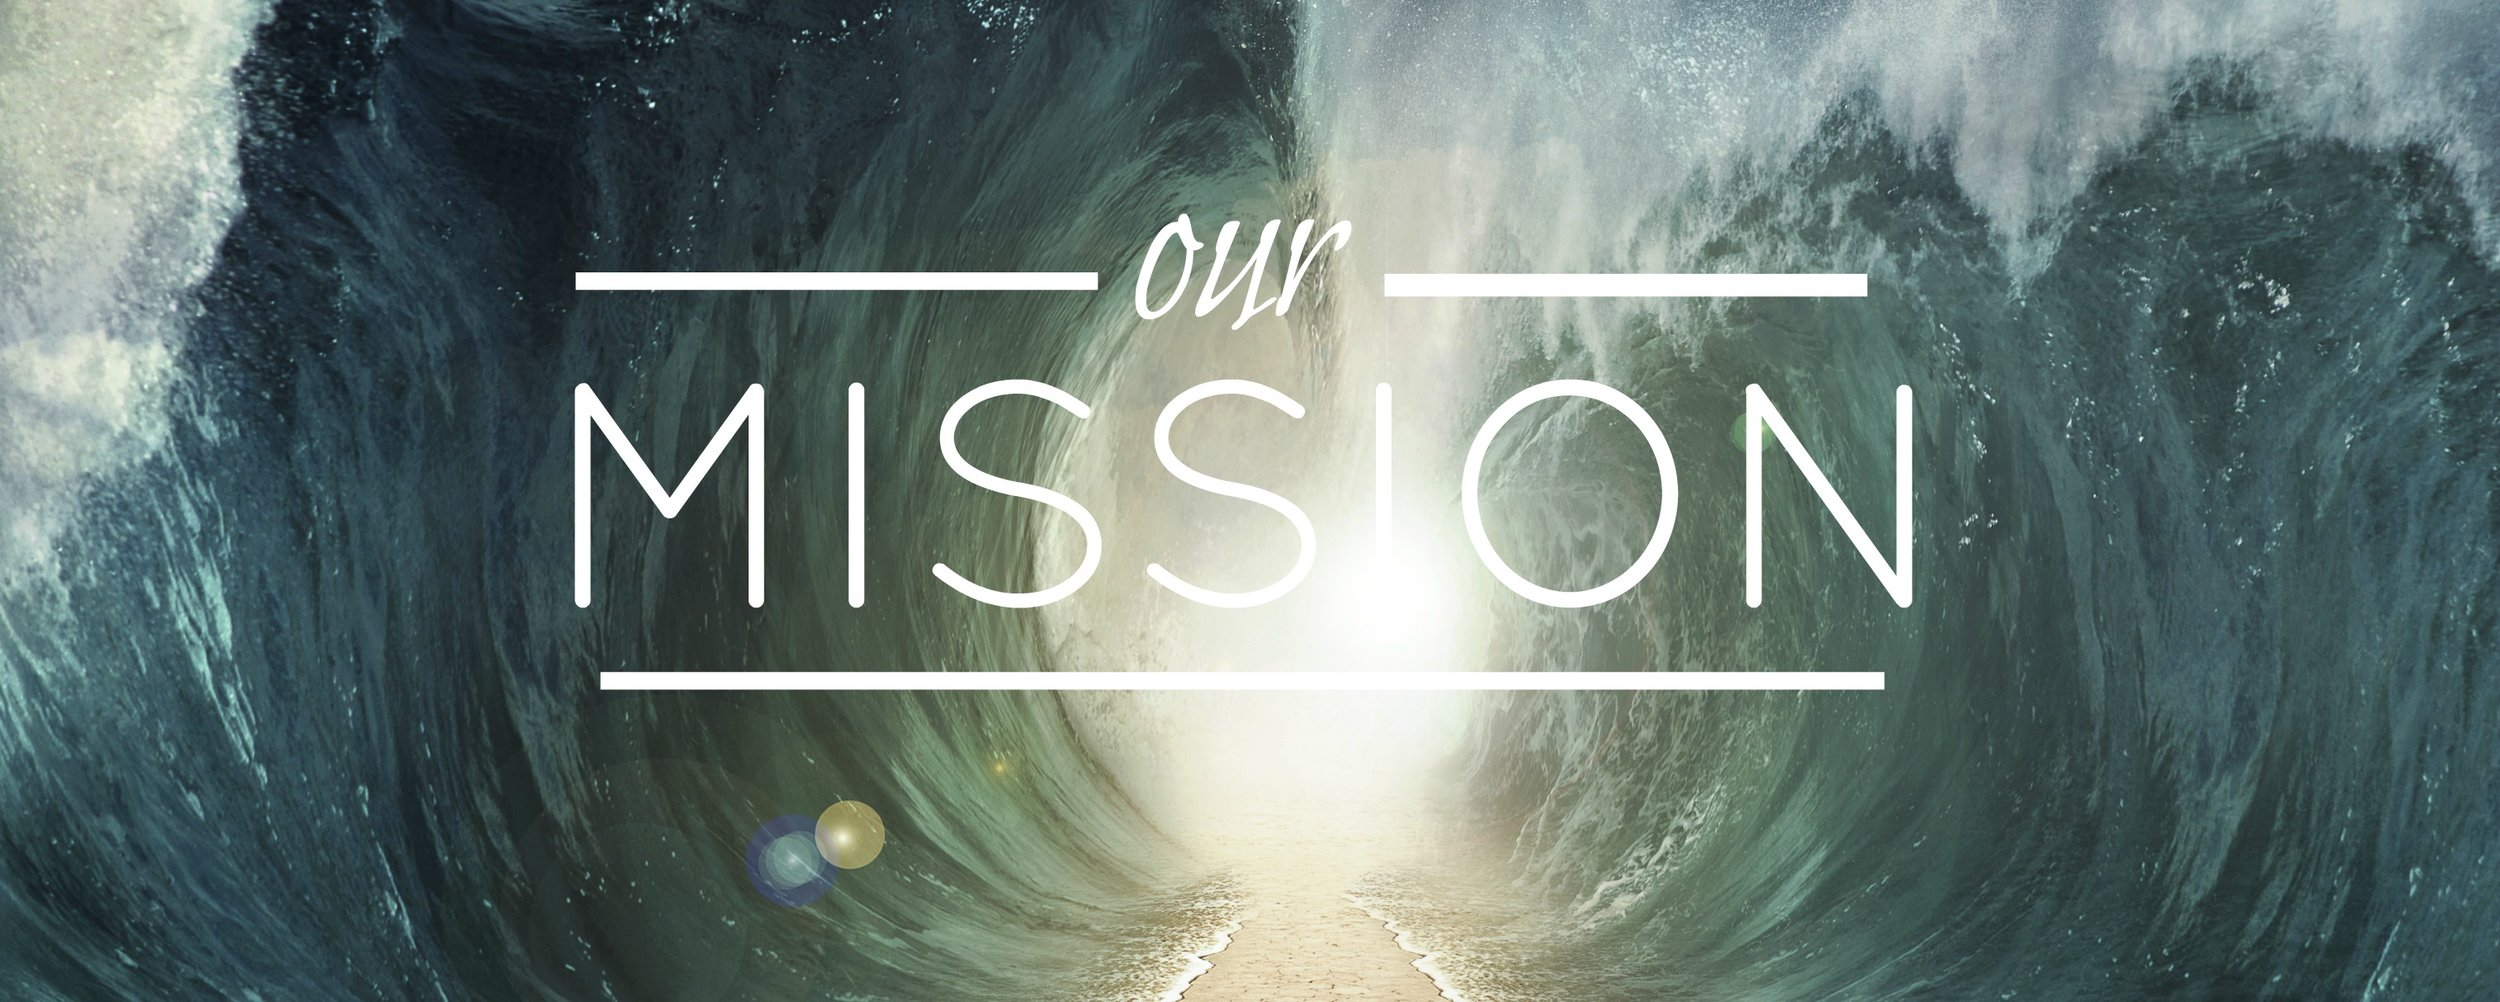 CMBC MISSION.jpg